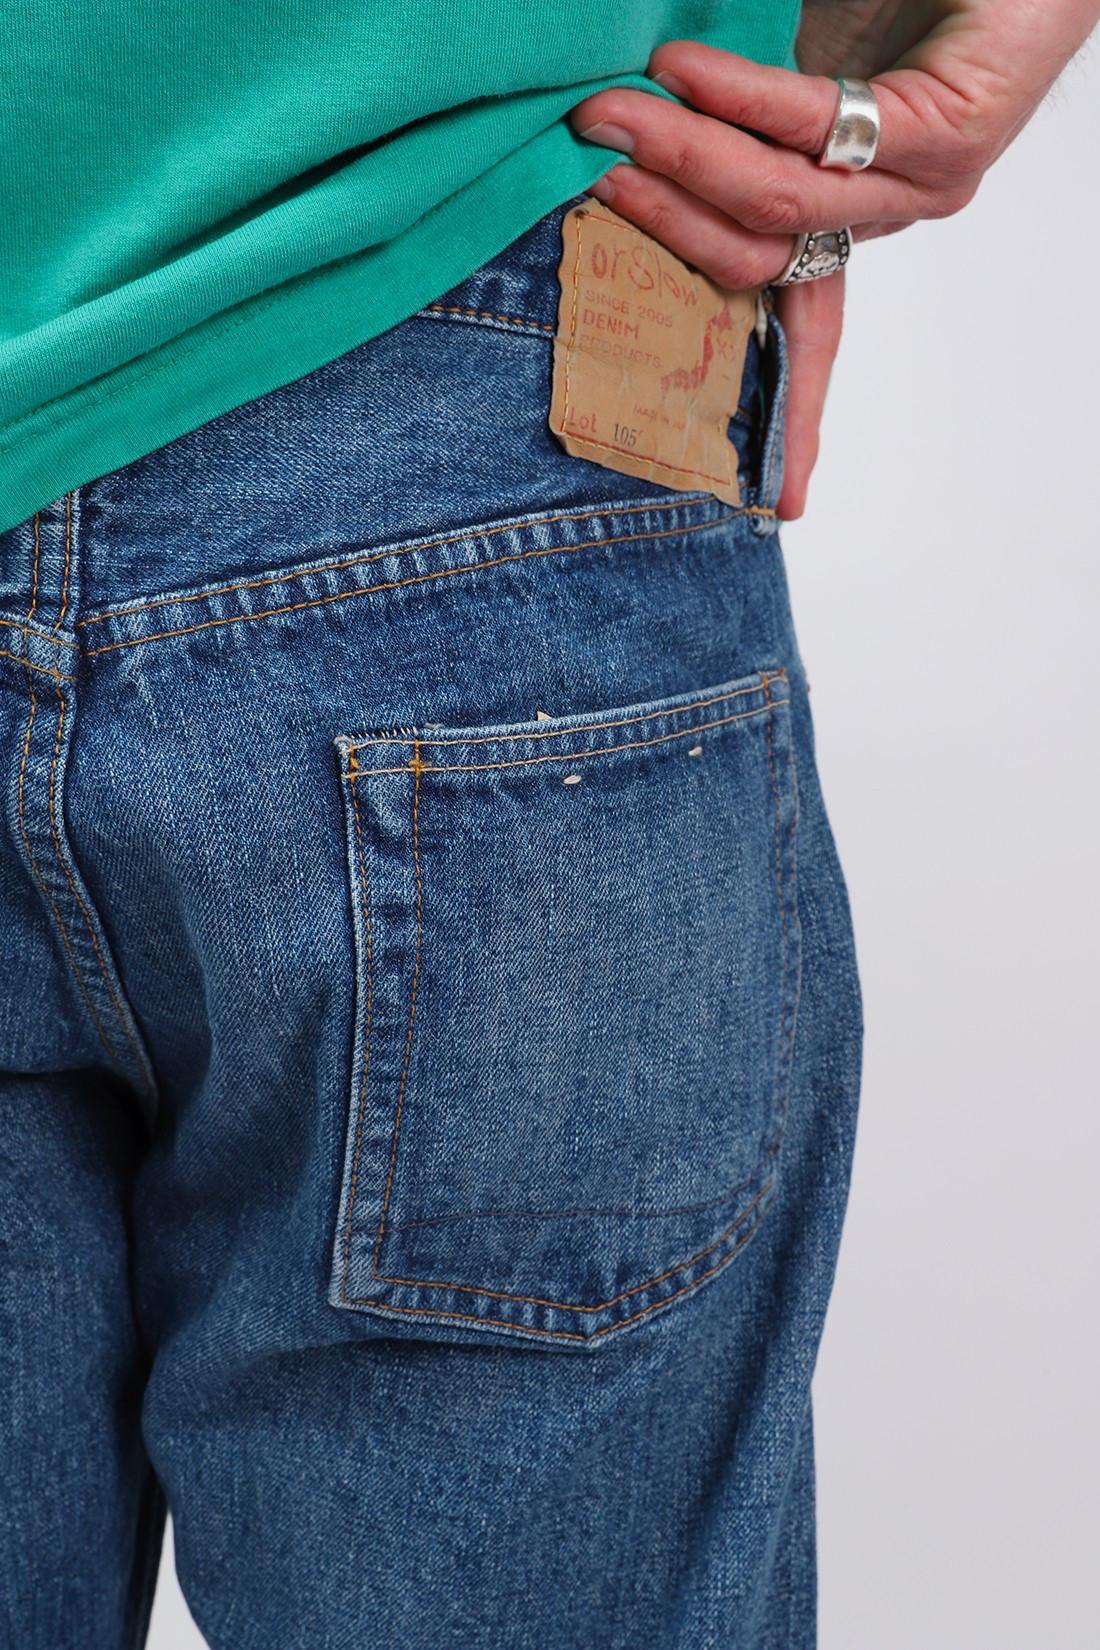 ORSLOW / 105 standard jean denim 2 year wash